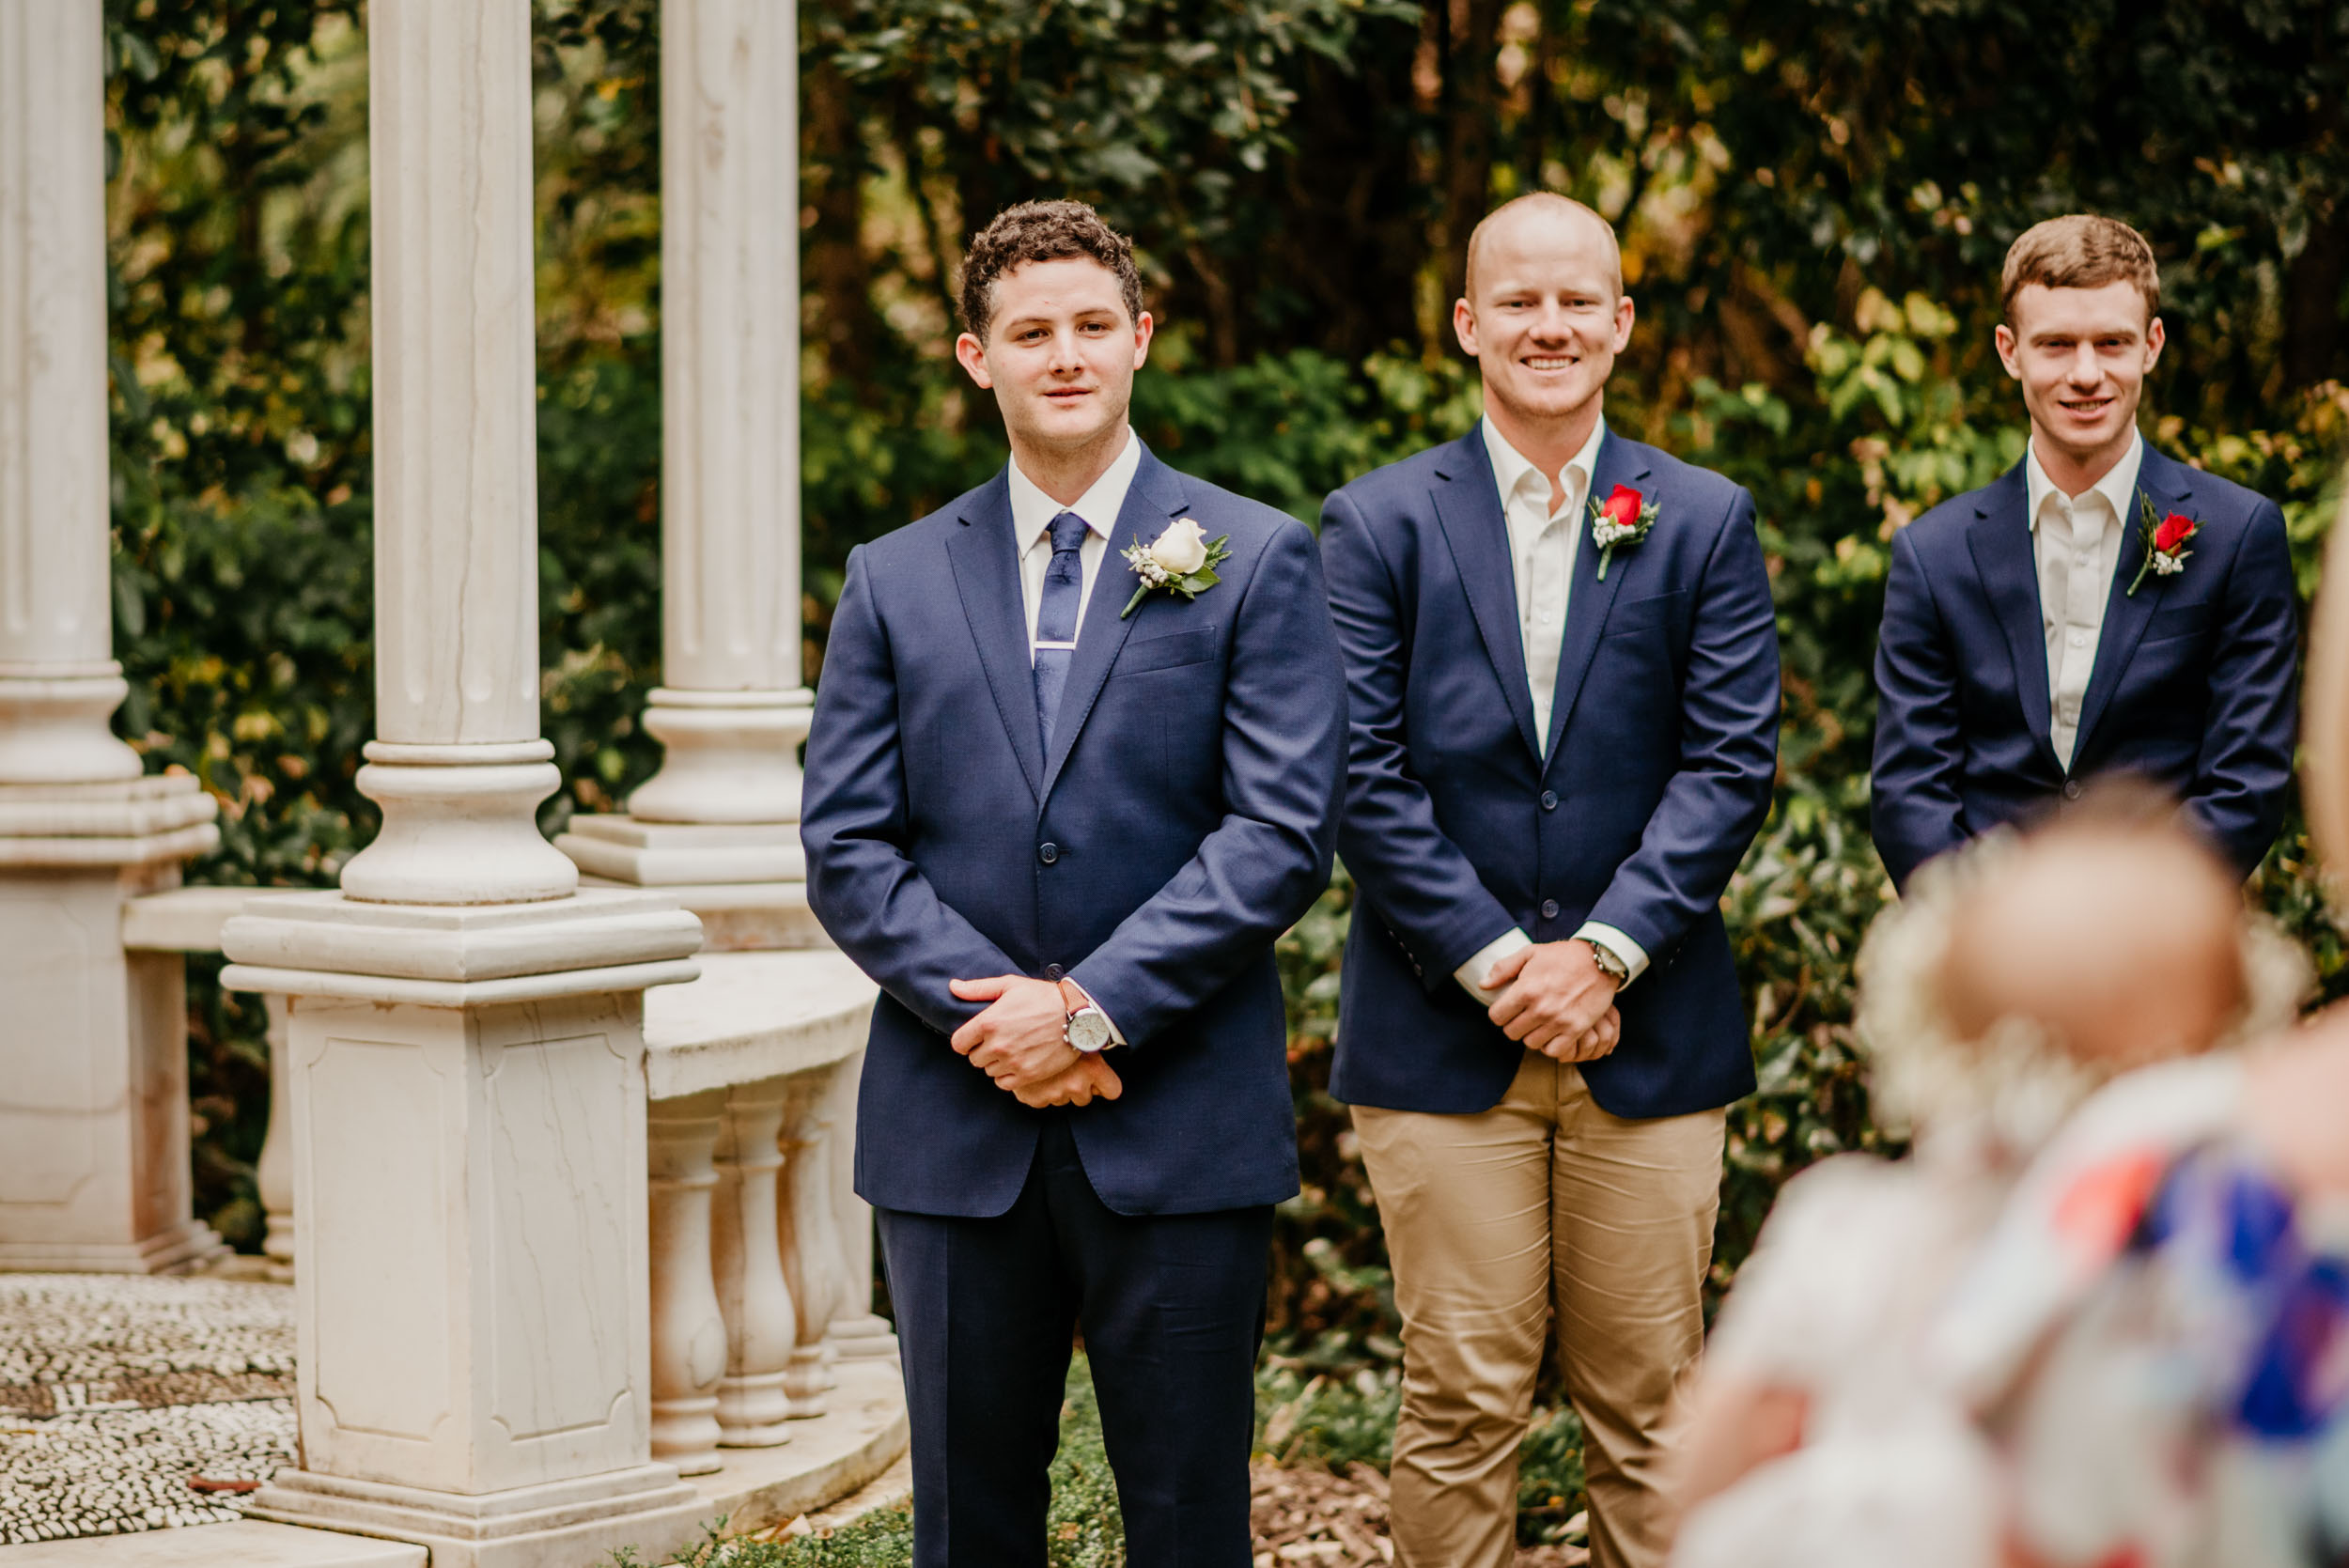 The Raw Photographer - Cairns Wedding Photographer - Laloli - Cairns Garden Ceremony - Cane Fields Photo Shoot-32.jpg